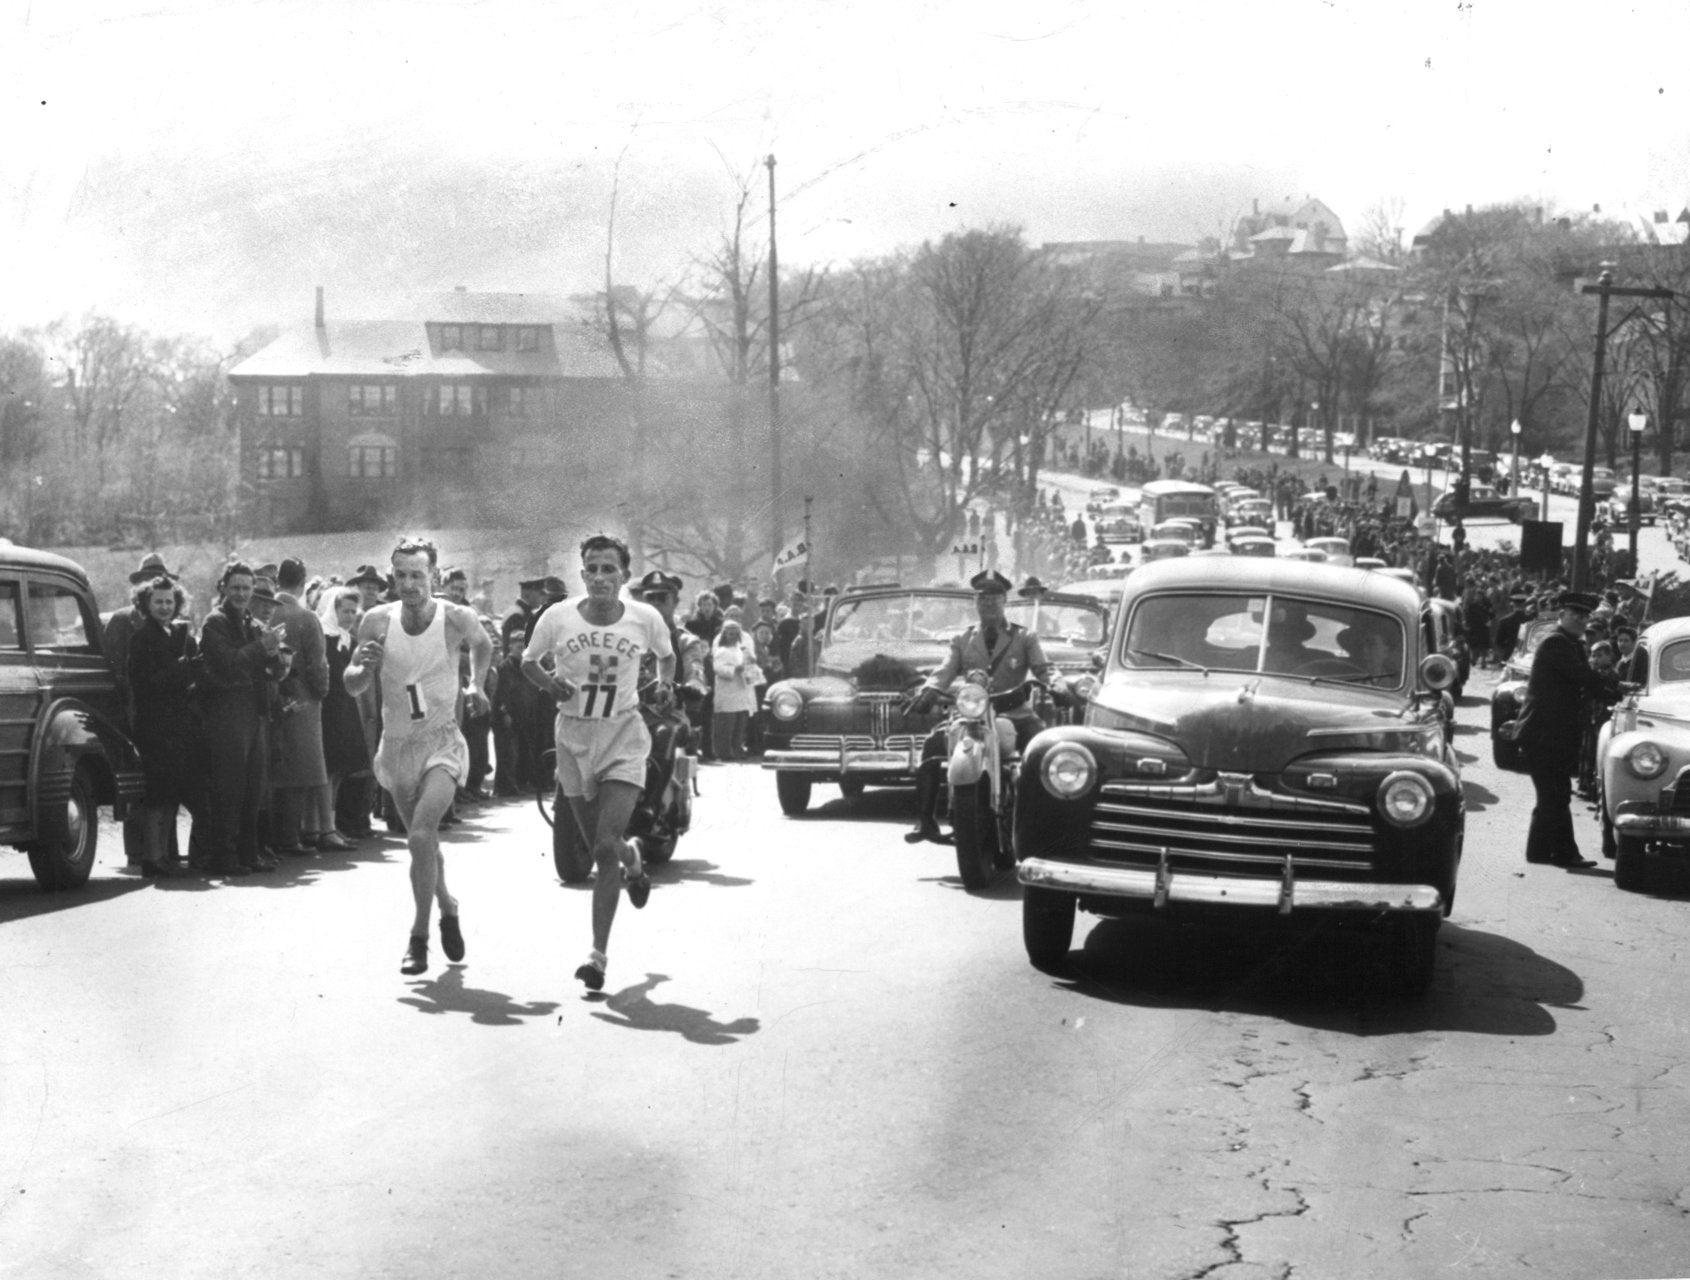 Stylianos Kyriakides and John A. Kelley running the 1946 Boston Marathon.